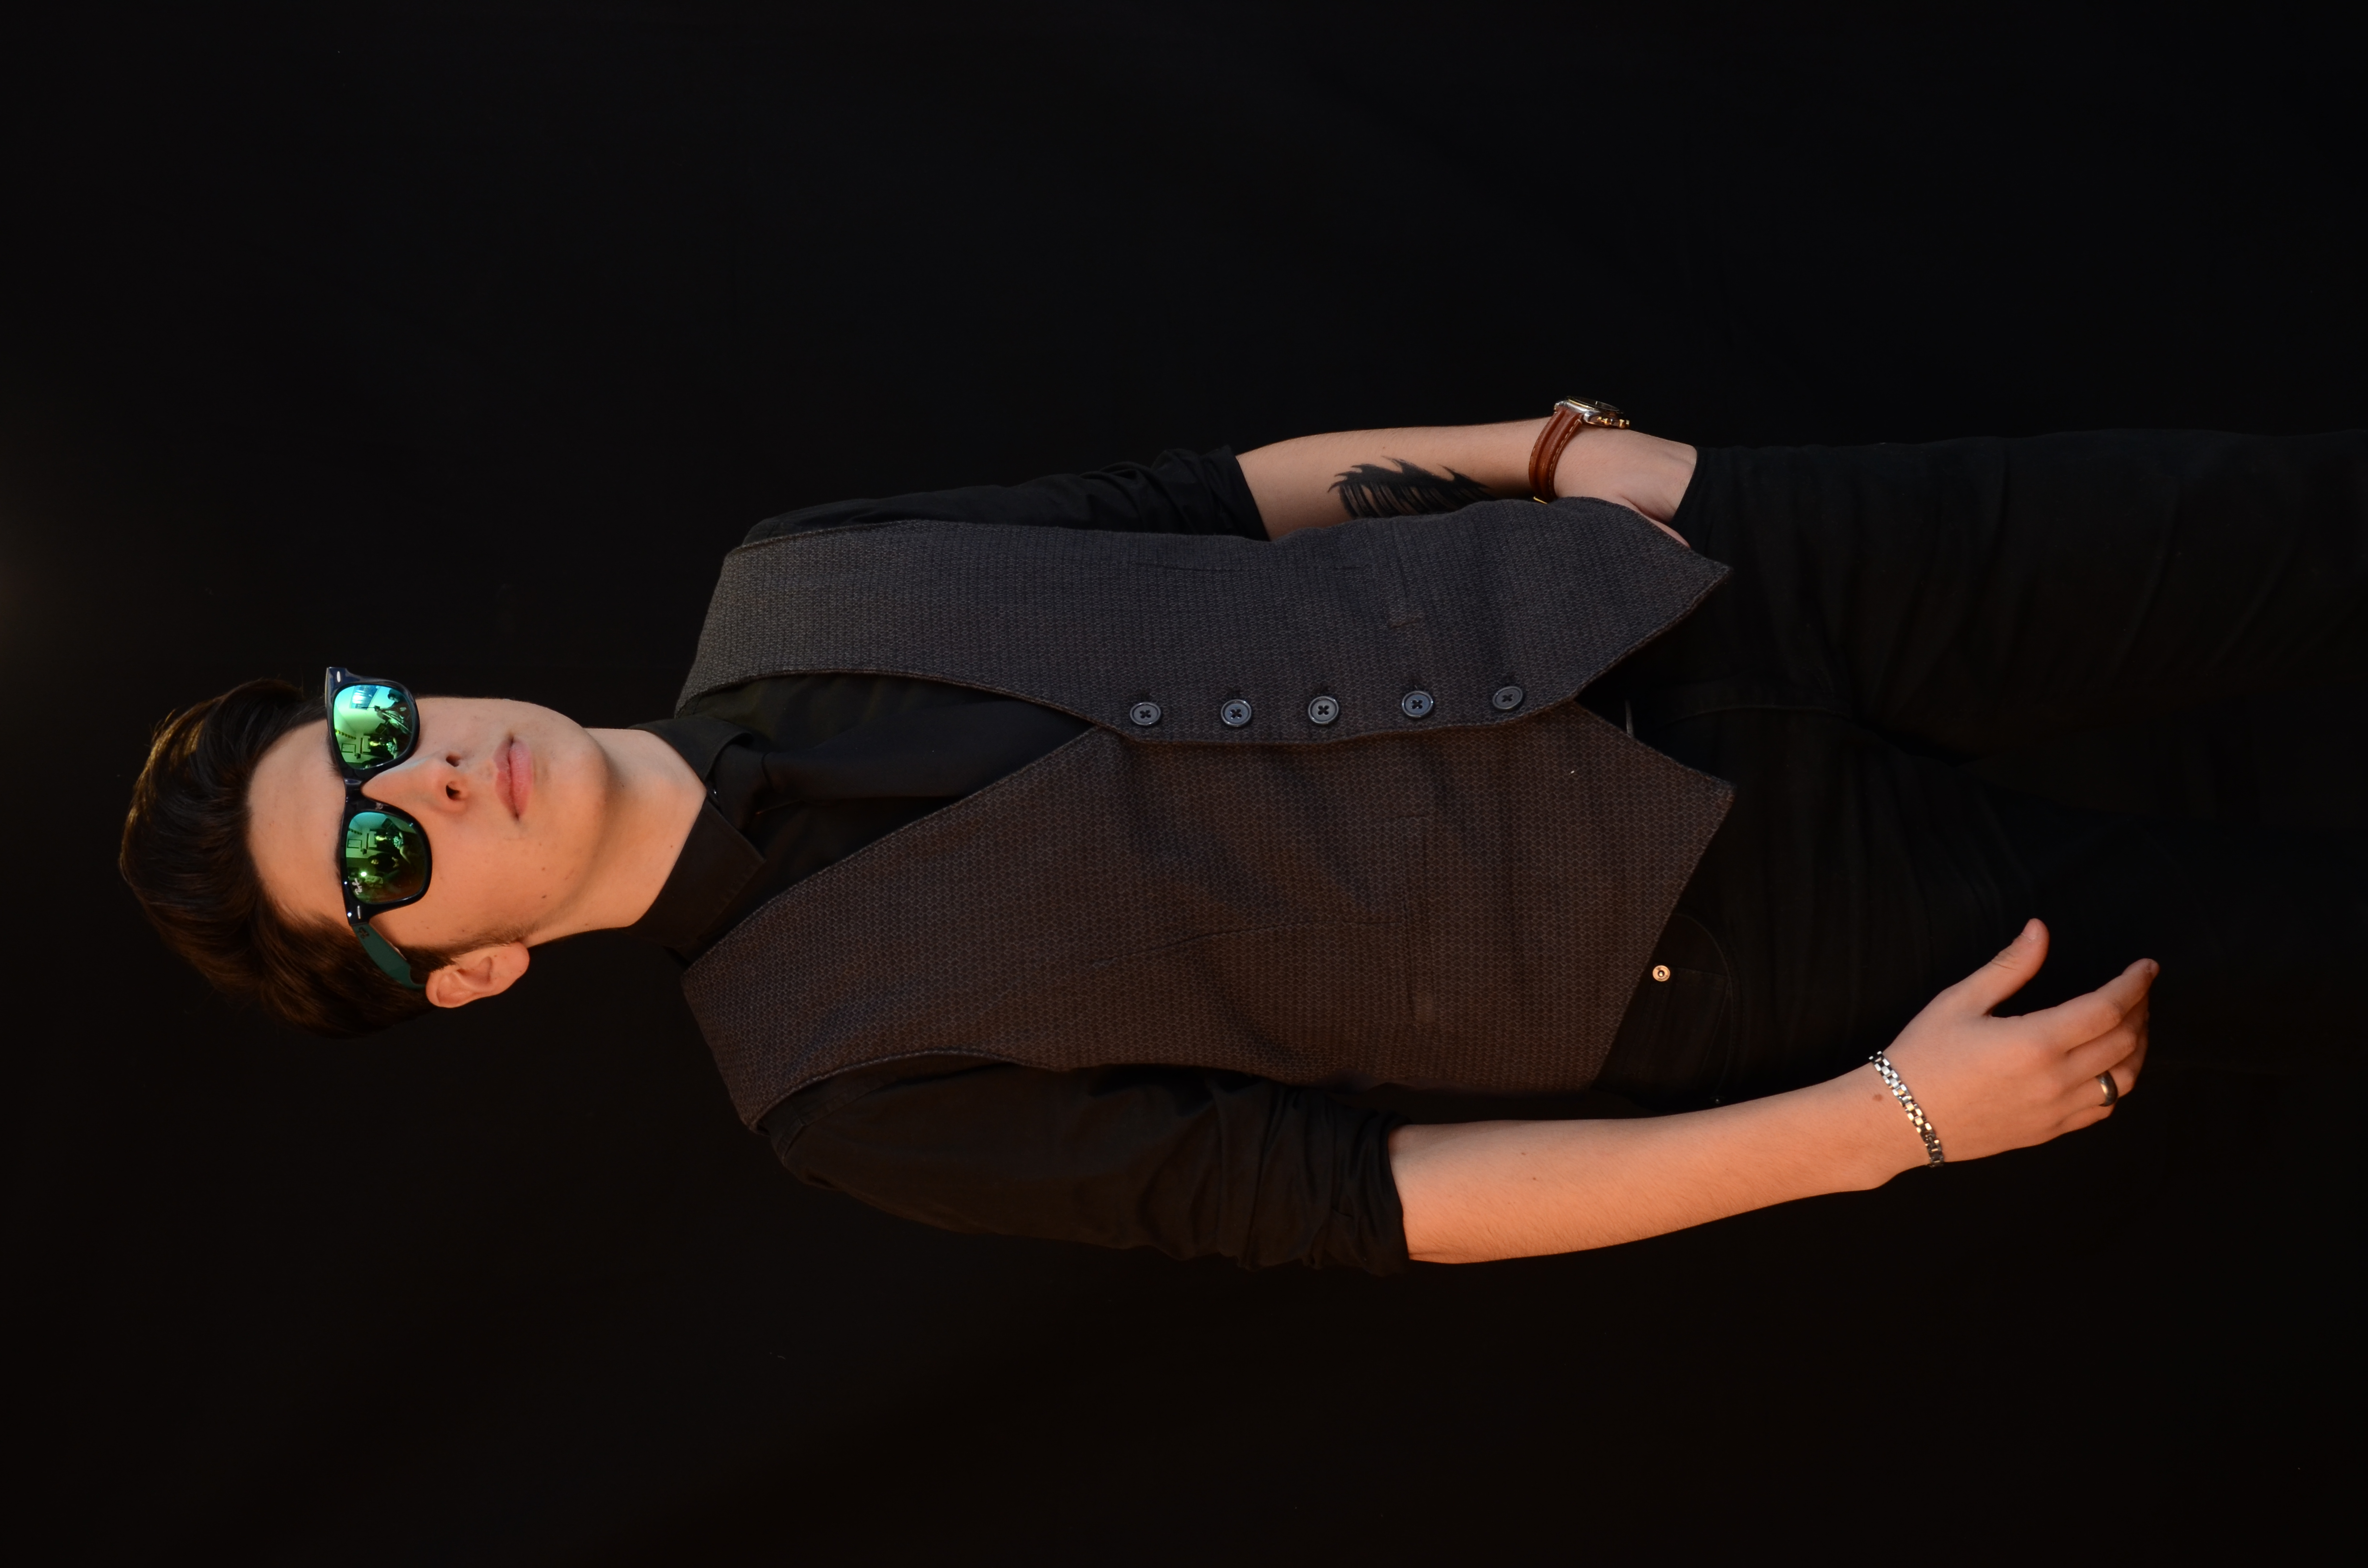 Matteo Zaccarello WeFly Band